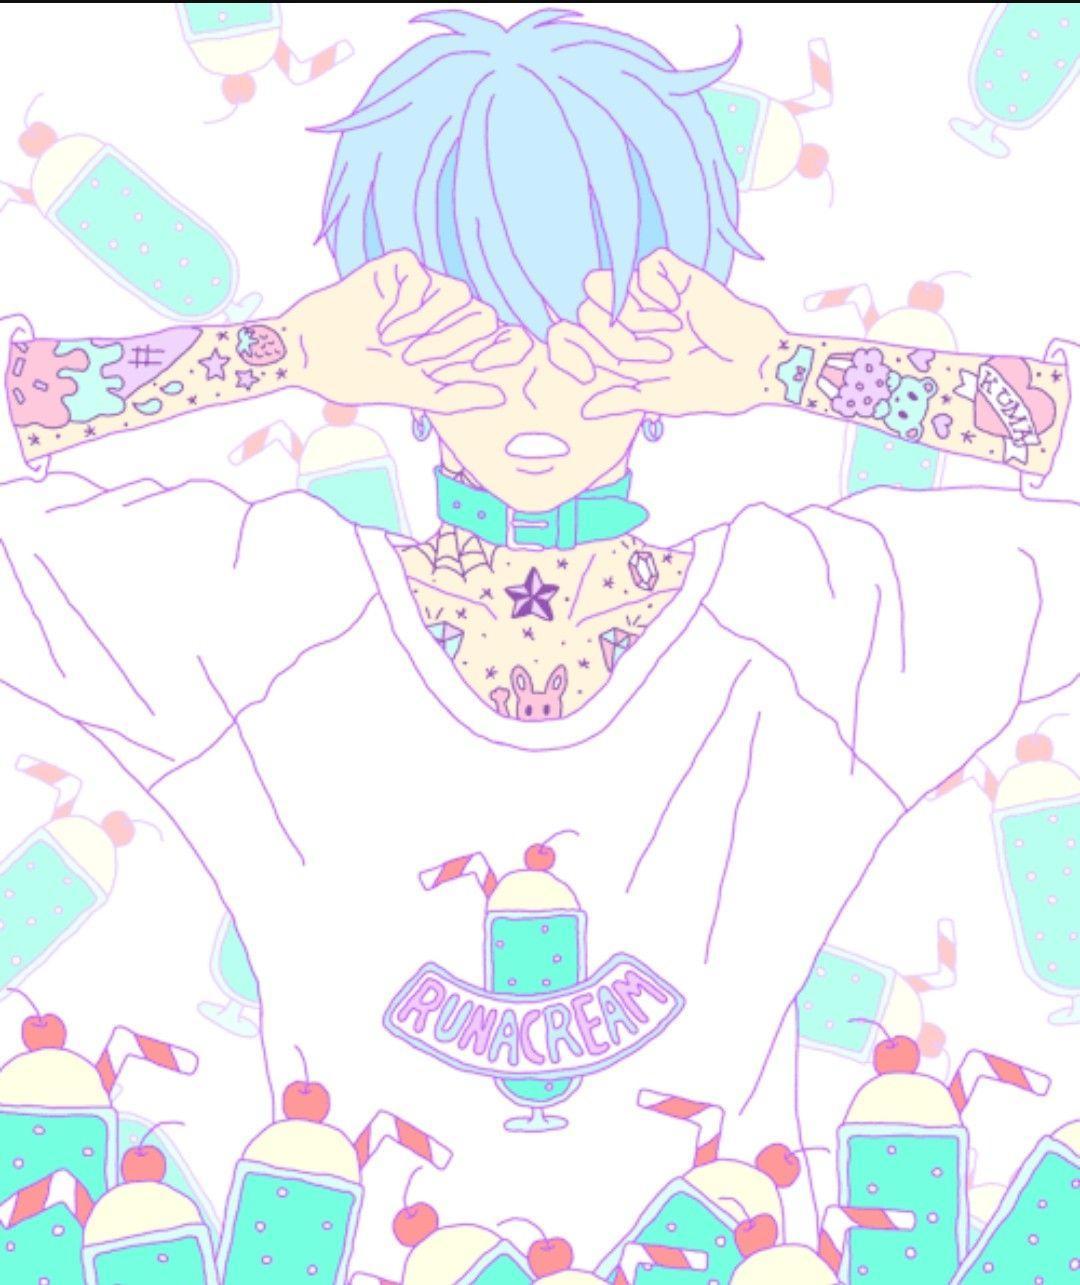 Kawaii Anime Aesthetic Wallpapers Wallpaper Cave